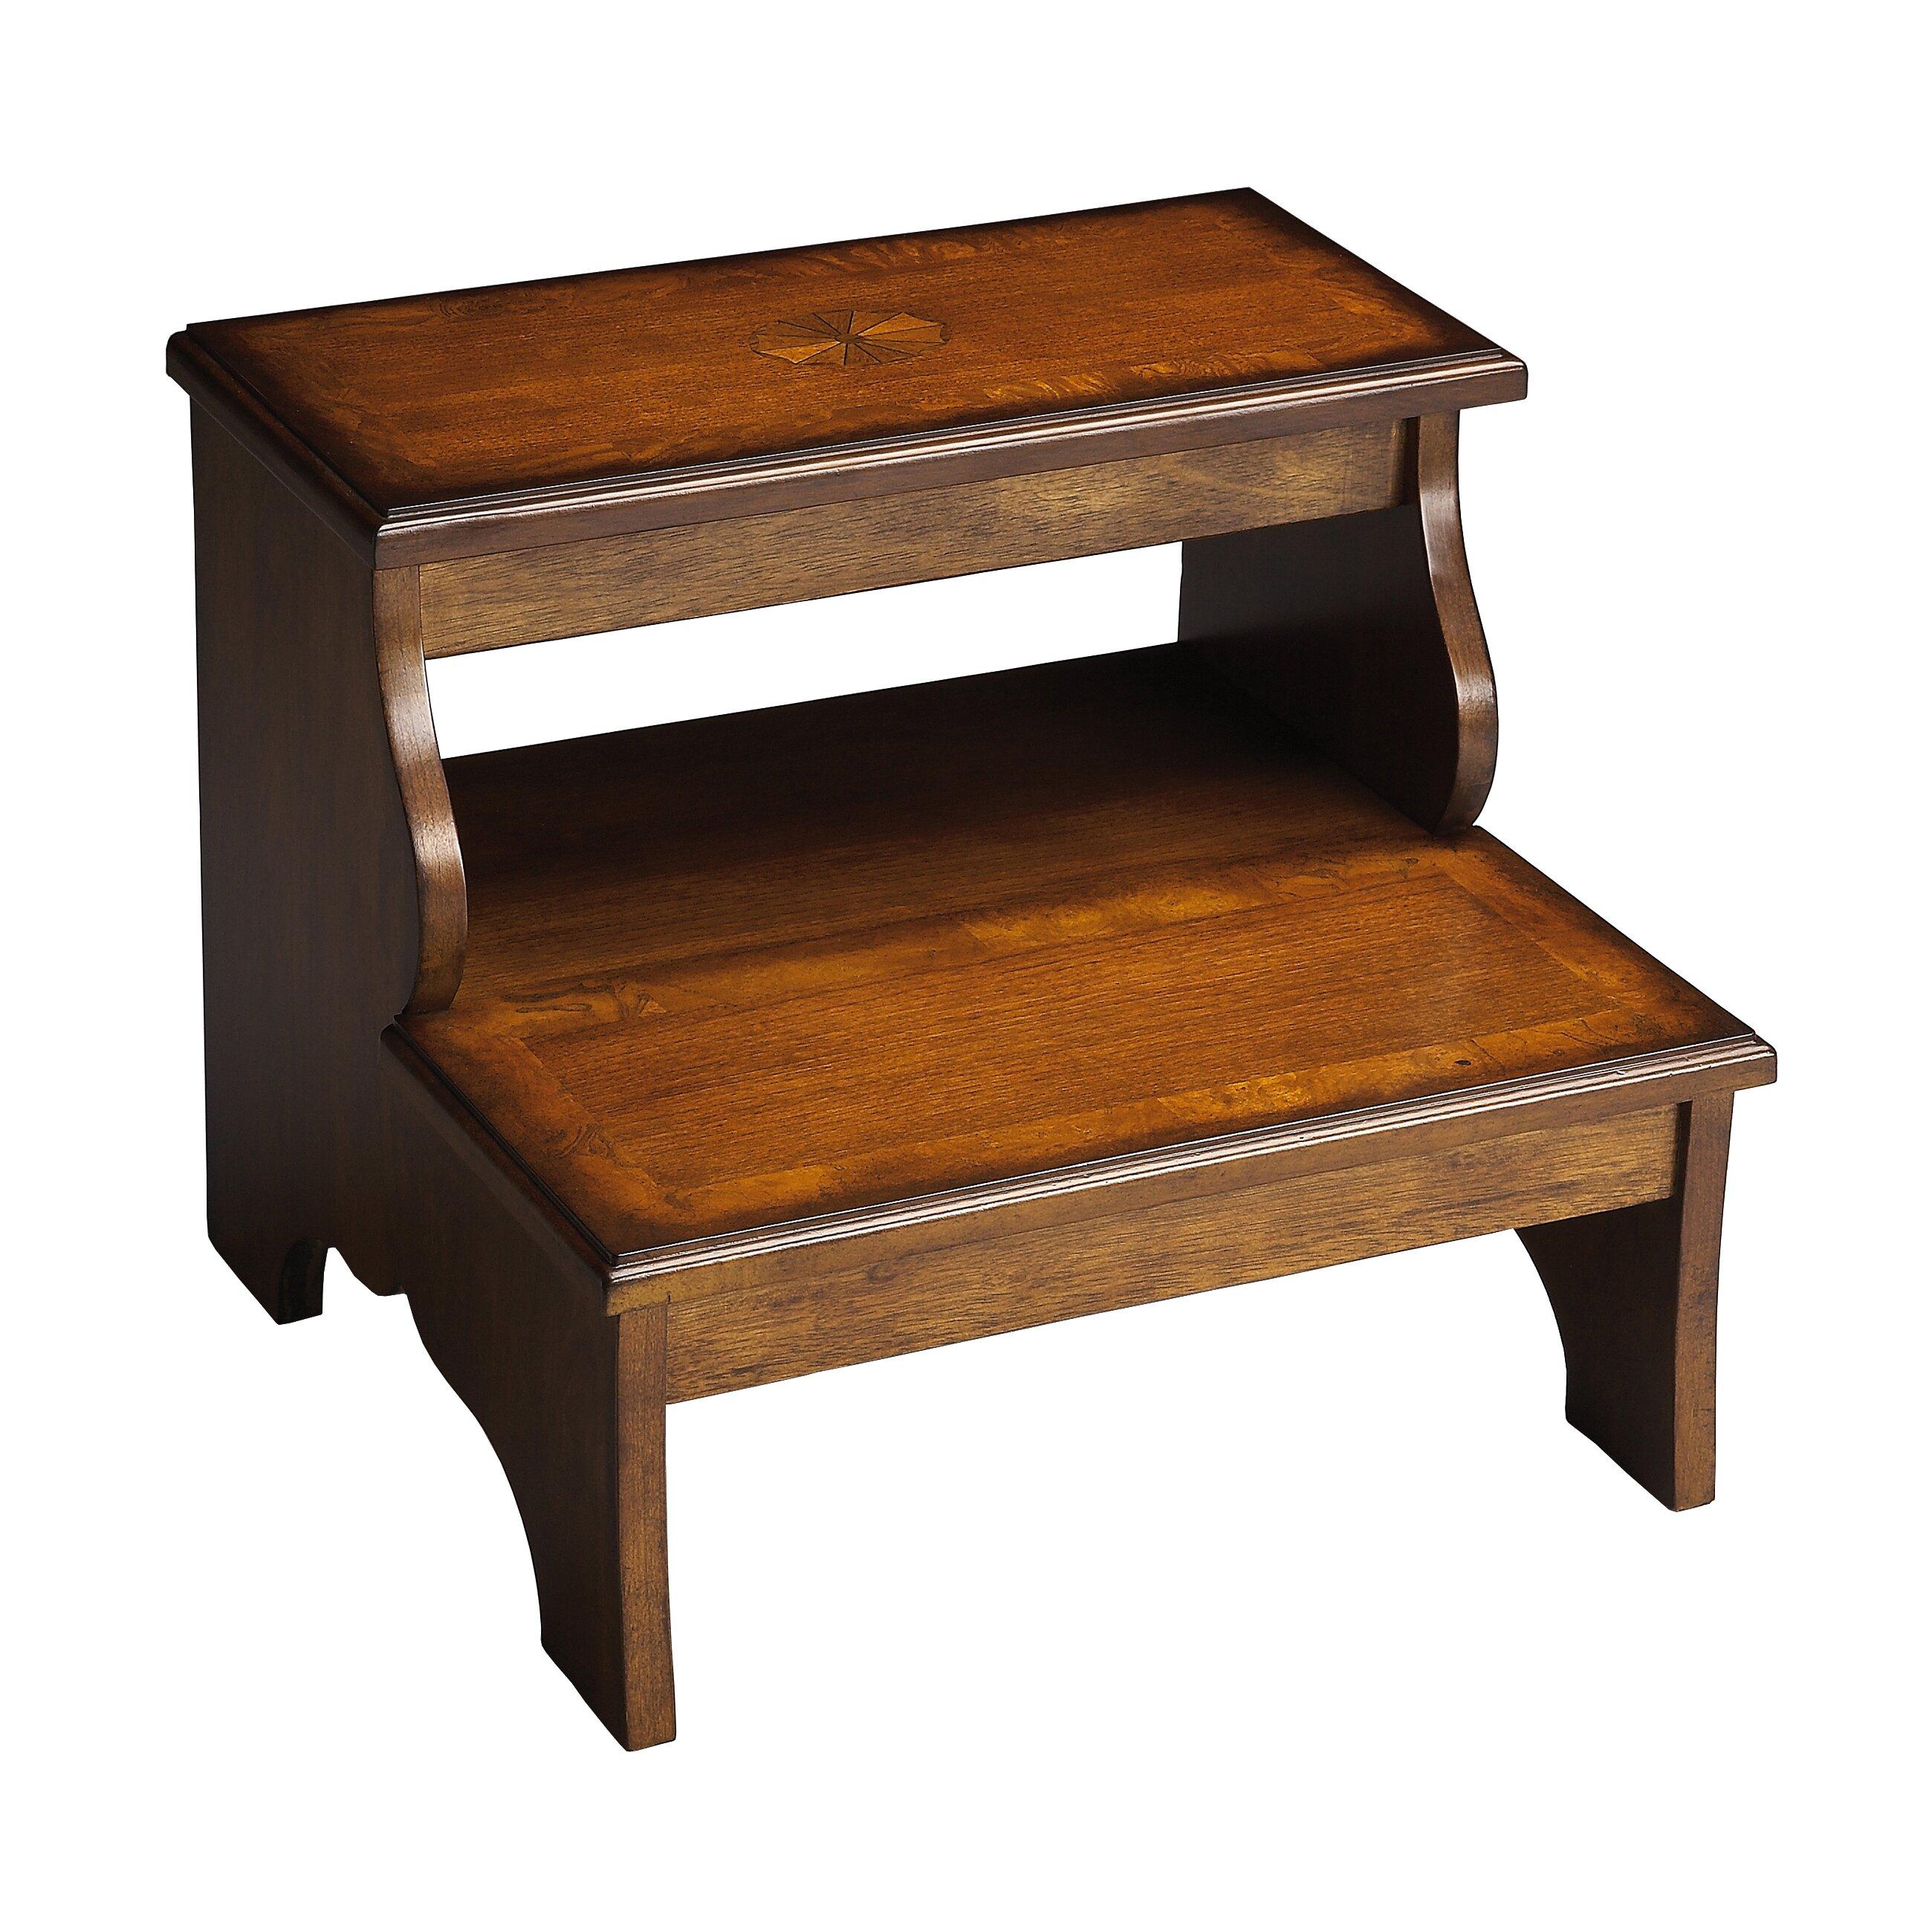 masterpiece 2 step wood step stool wayfair. Black Bedroom Furniture Sets. Home Design Ideas